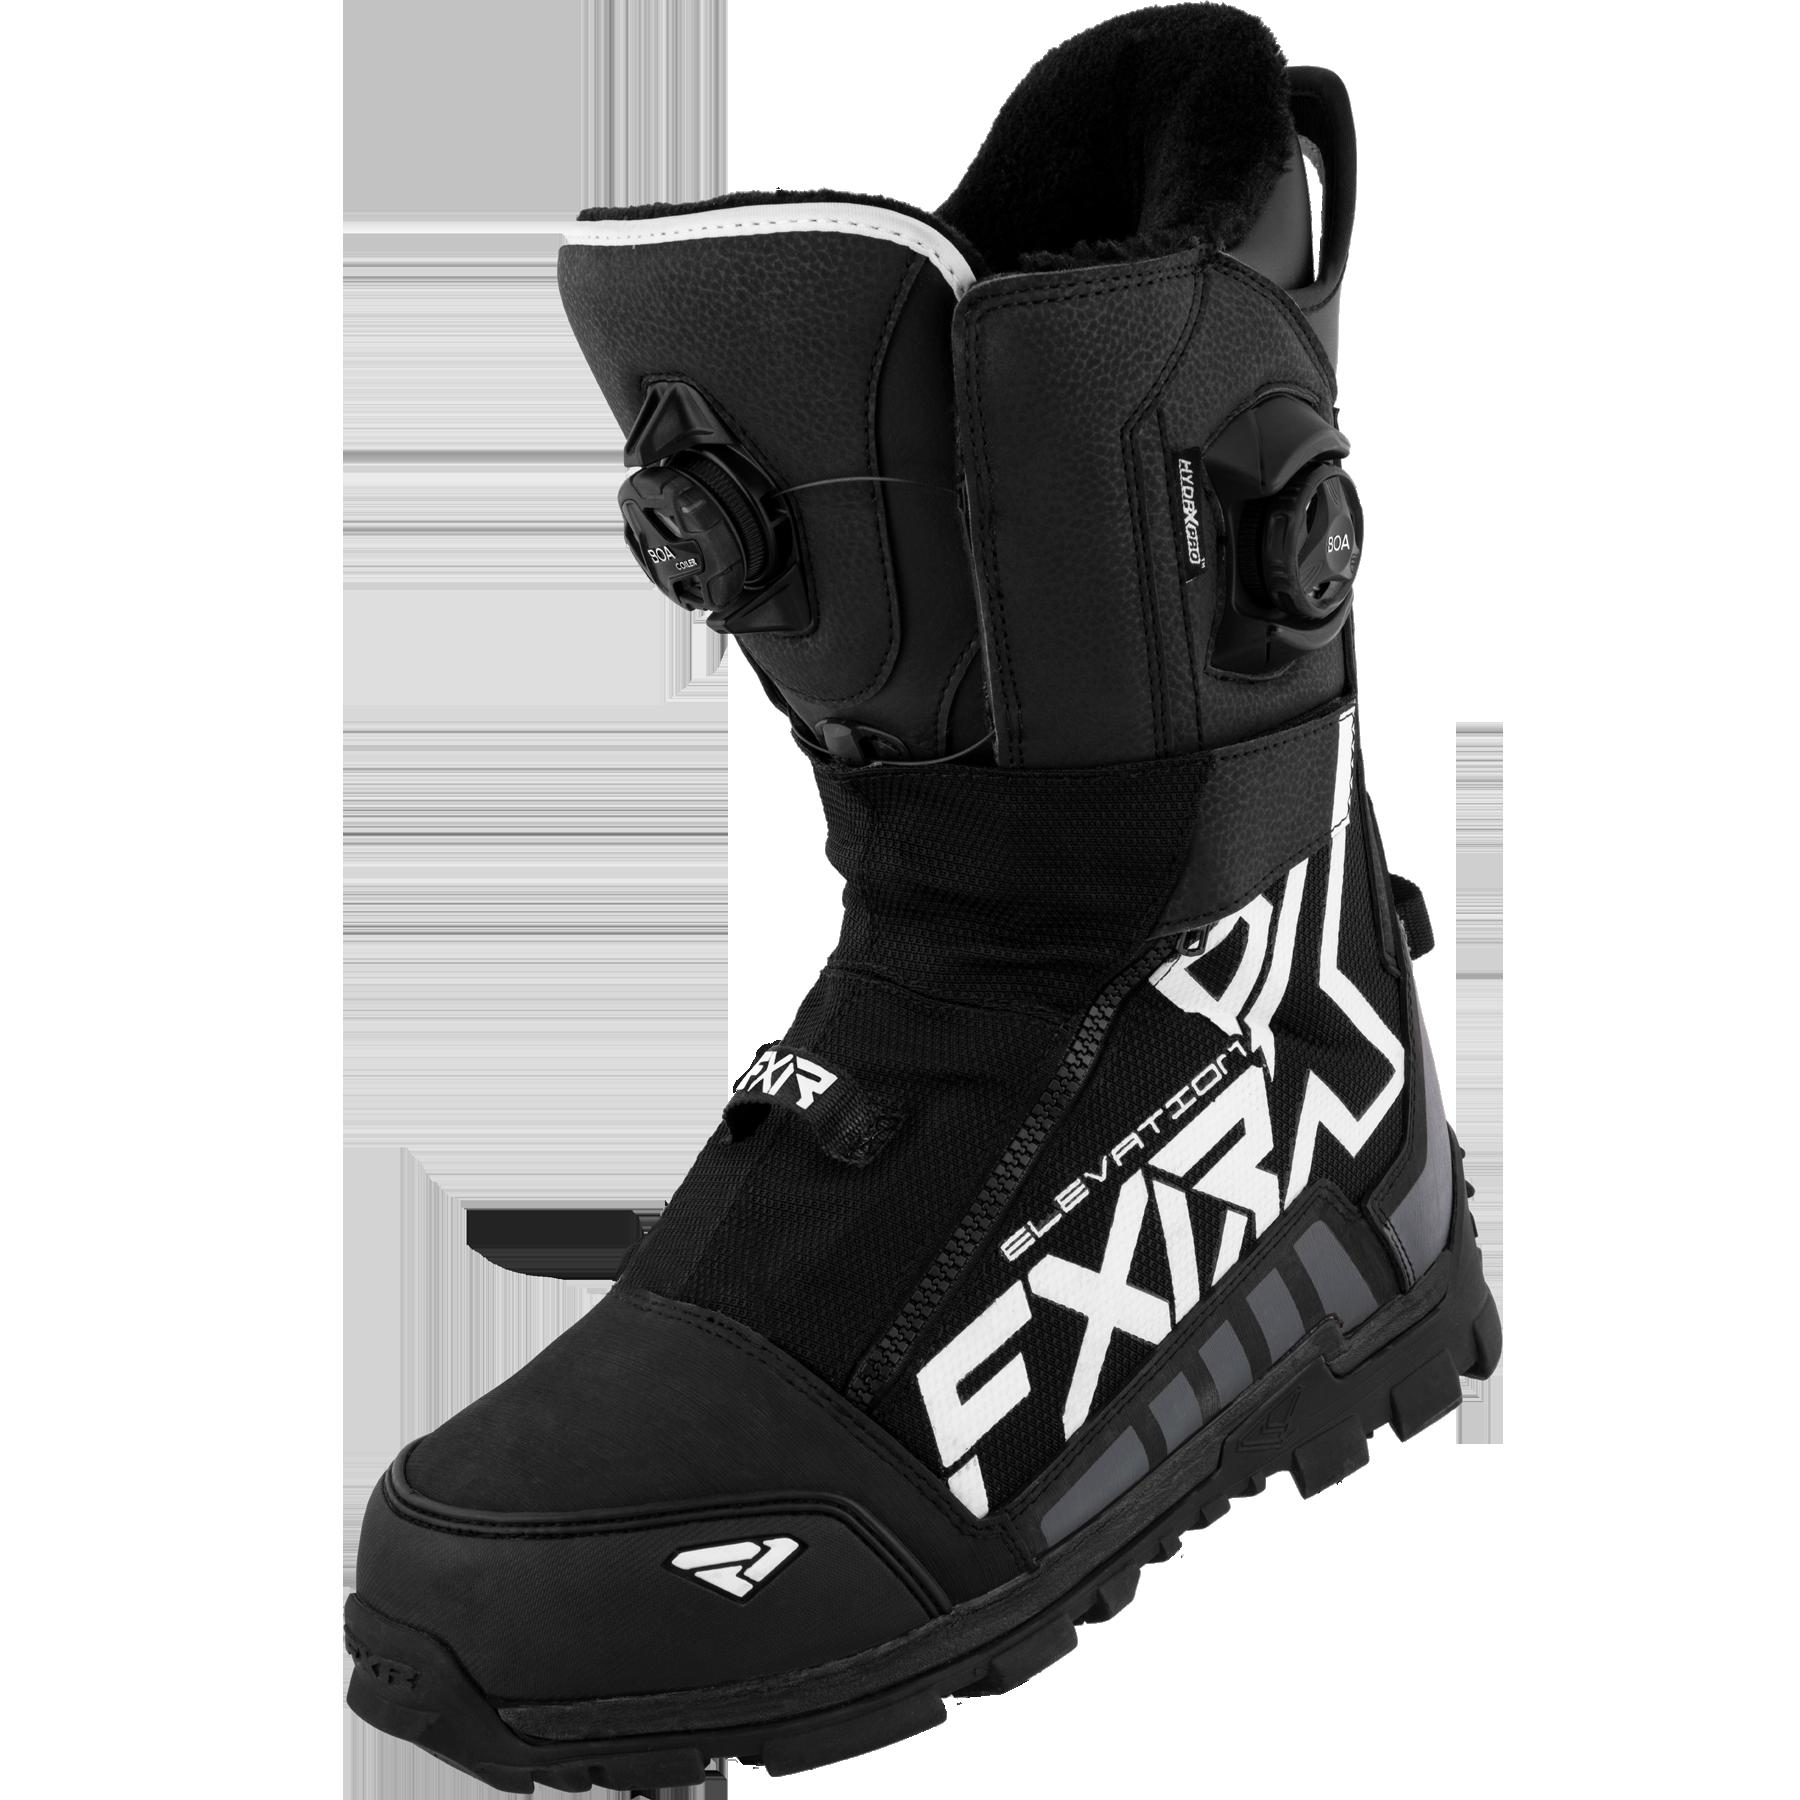 Elevation Dual Boa Boot 22 KI 7